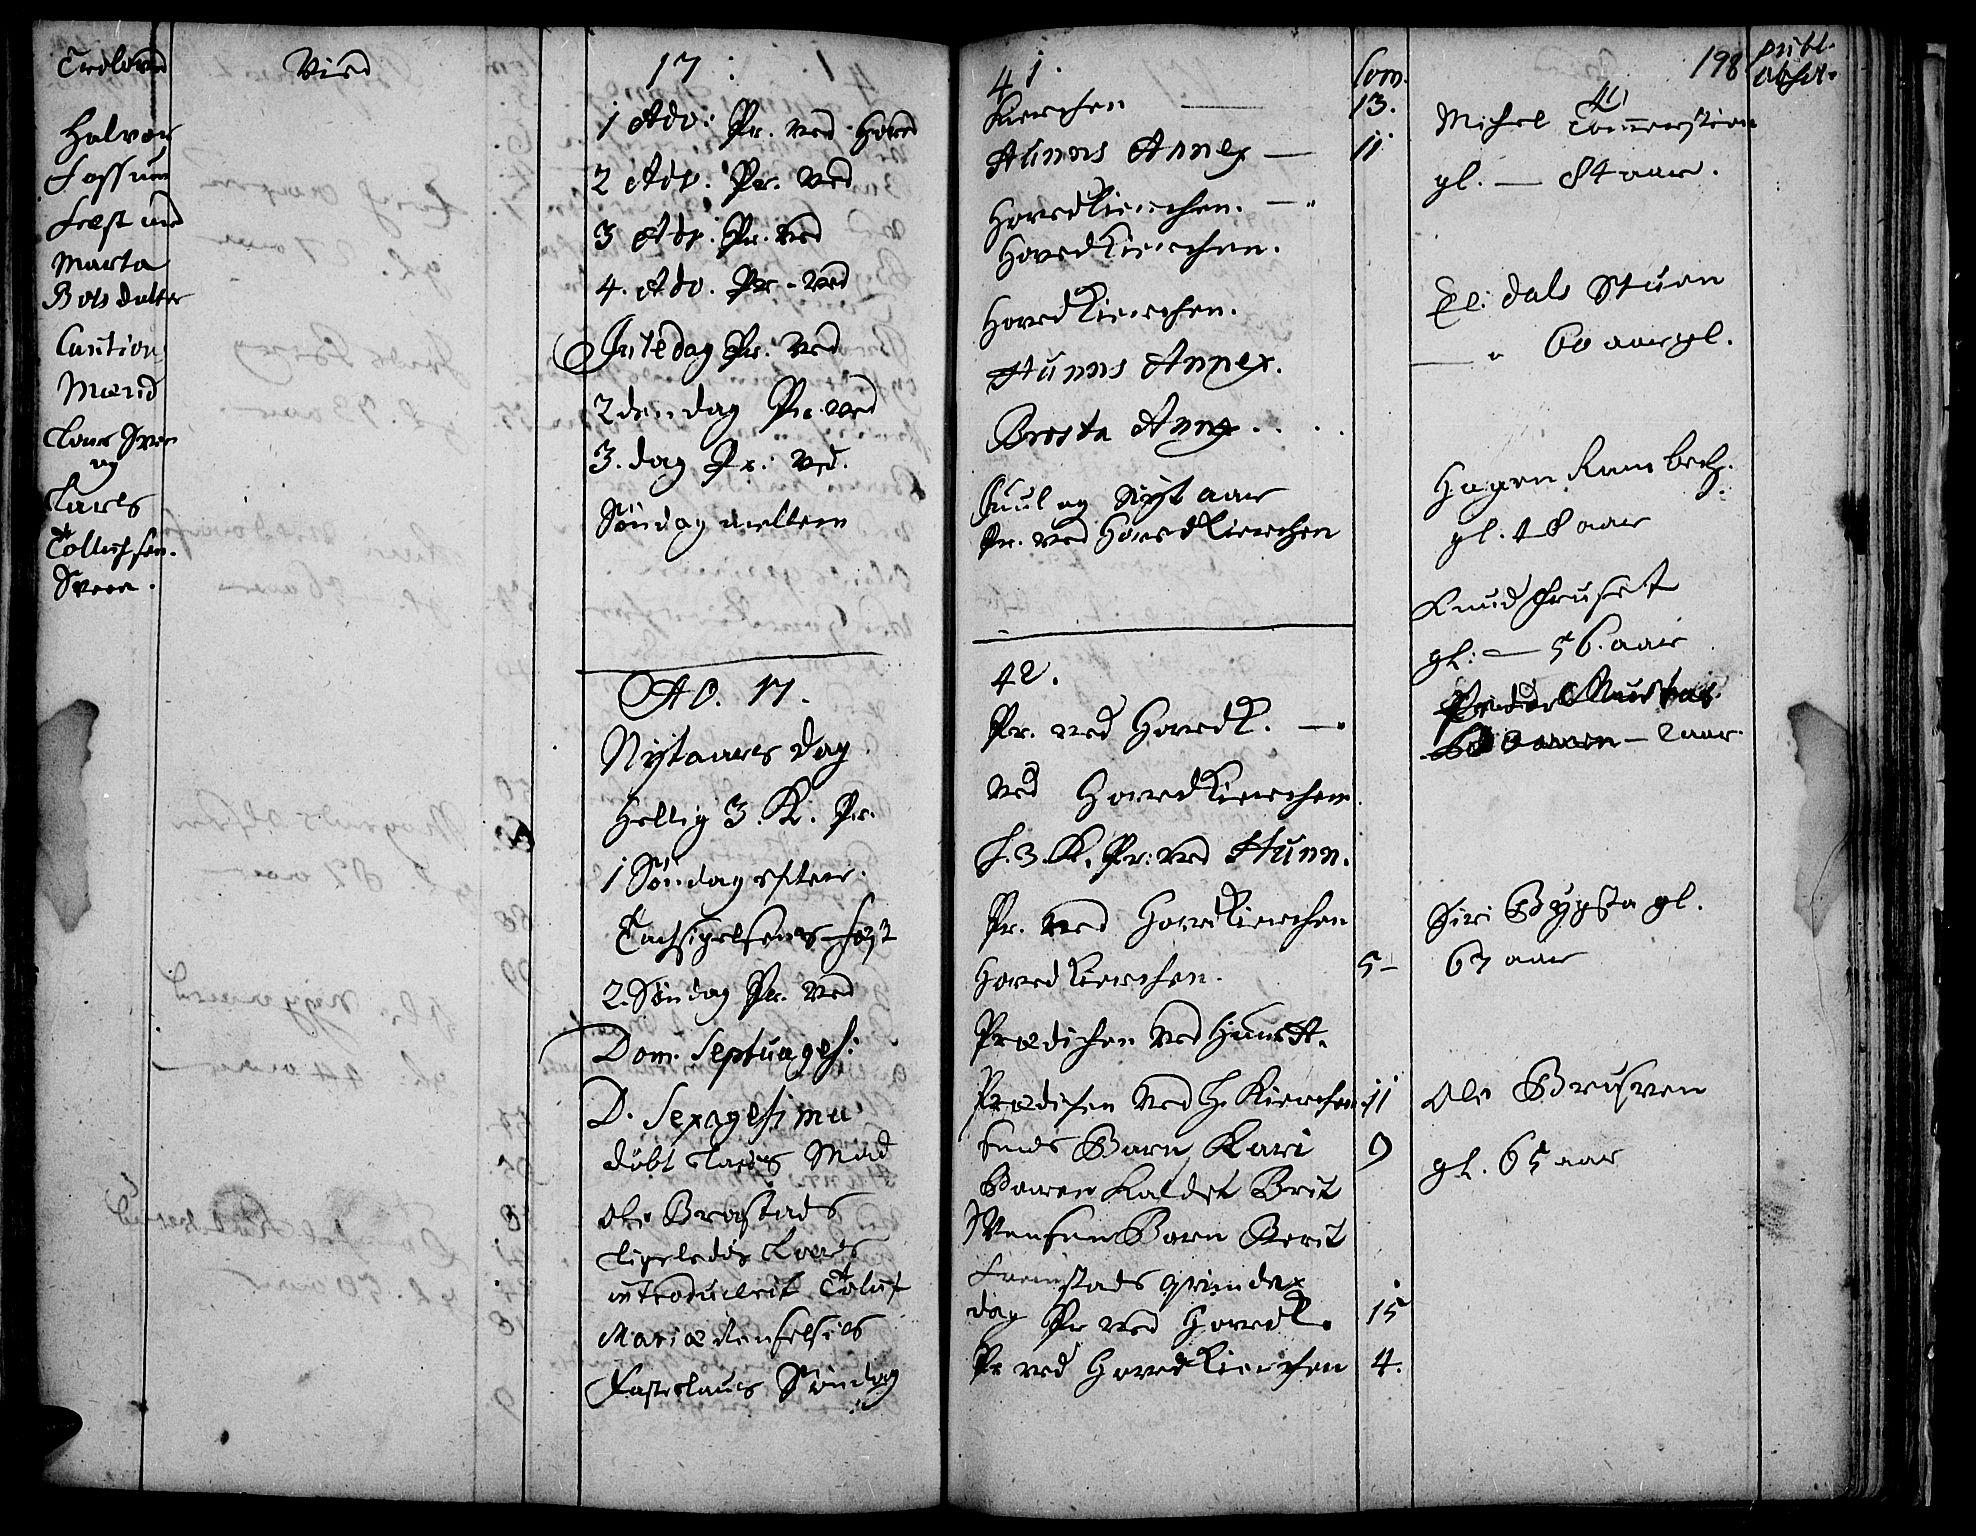 SAH, Vardal prestekontor, H/Ha/Haa/L0001: Ministerialbok nr. 1, 1706-1748, s. 198